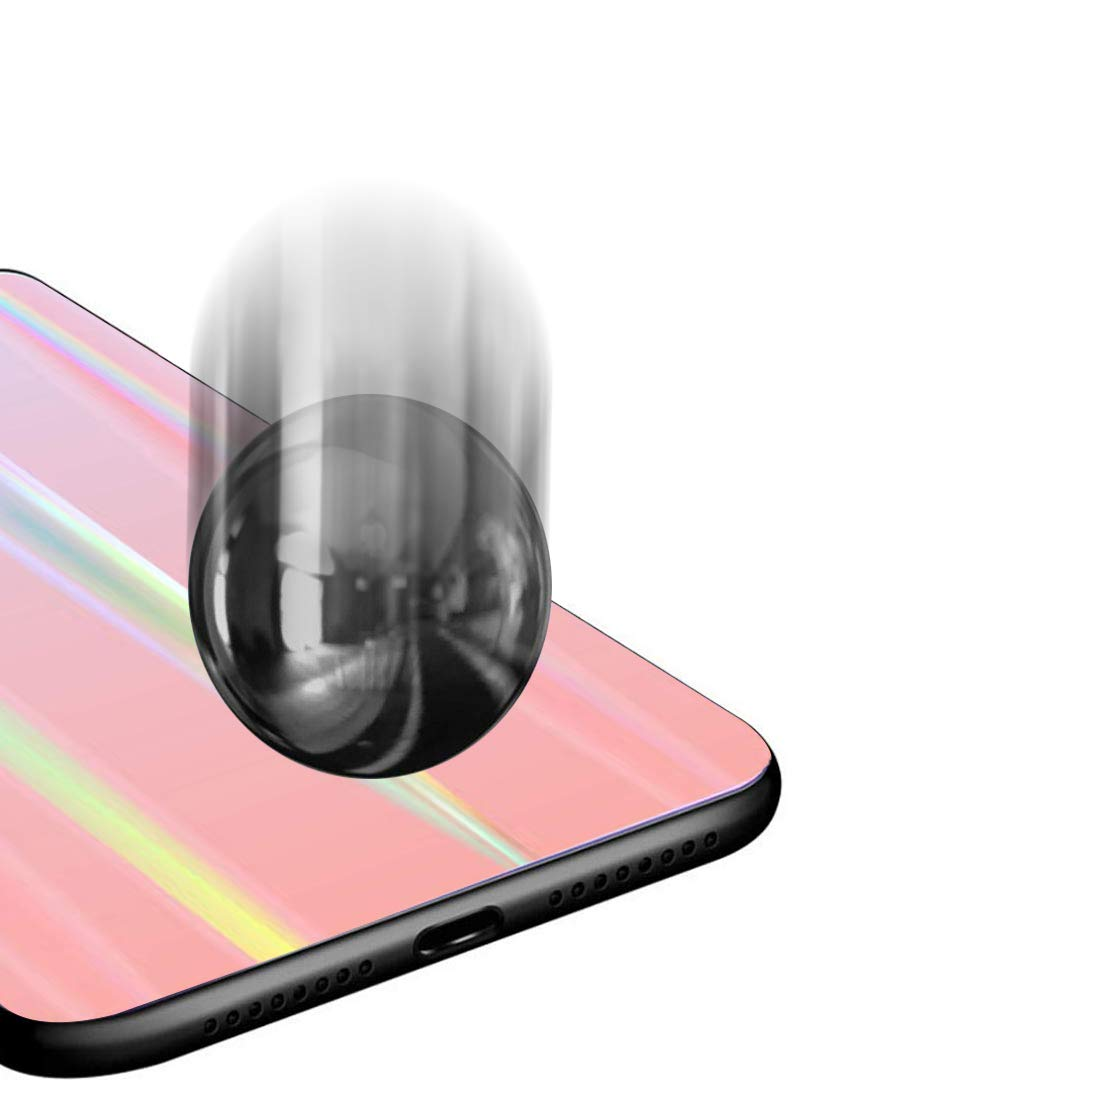 Plus H/ülle 9H Geh/ärtetem Marmor Glas R/ückseite mit TPU Rahmen Schutzh/ülle Ultra D/ünn Handyh/ülle Rahmen H/üllen Caler H/ülle Kompatibel mit Samsung Galaxy Note 10 Sto/ßfest Slim Kratzfest Shell Case